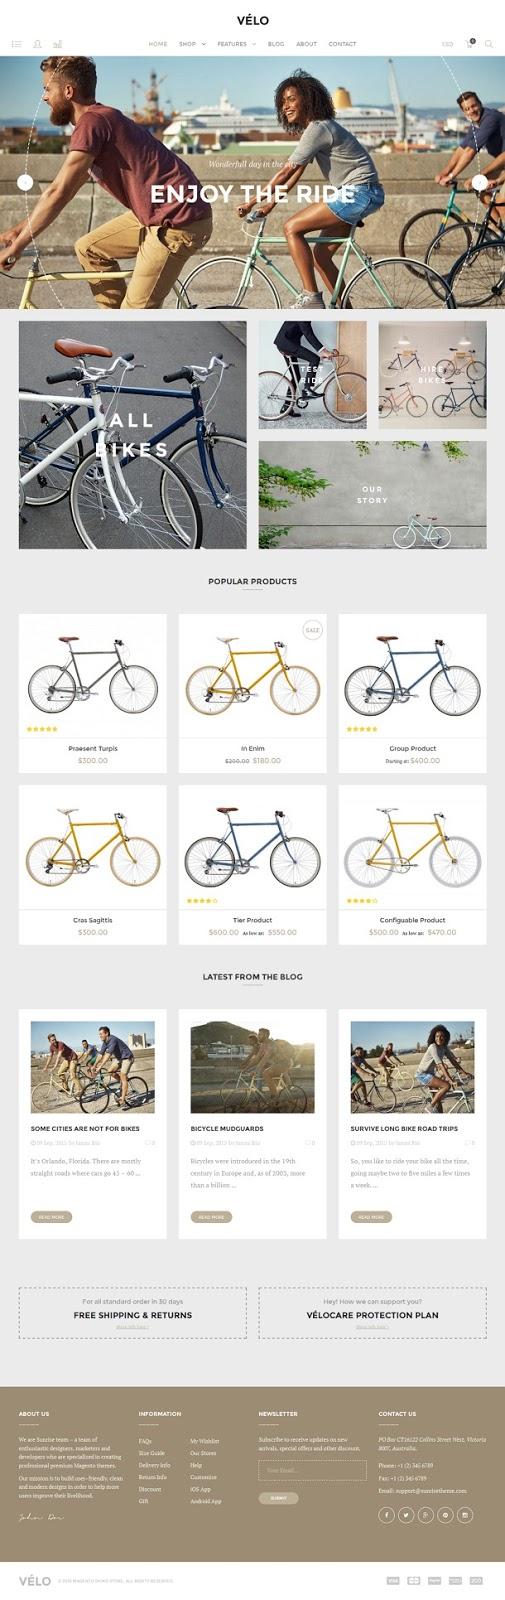 Velo Responsive Magento Theme for Bike Shops